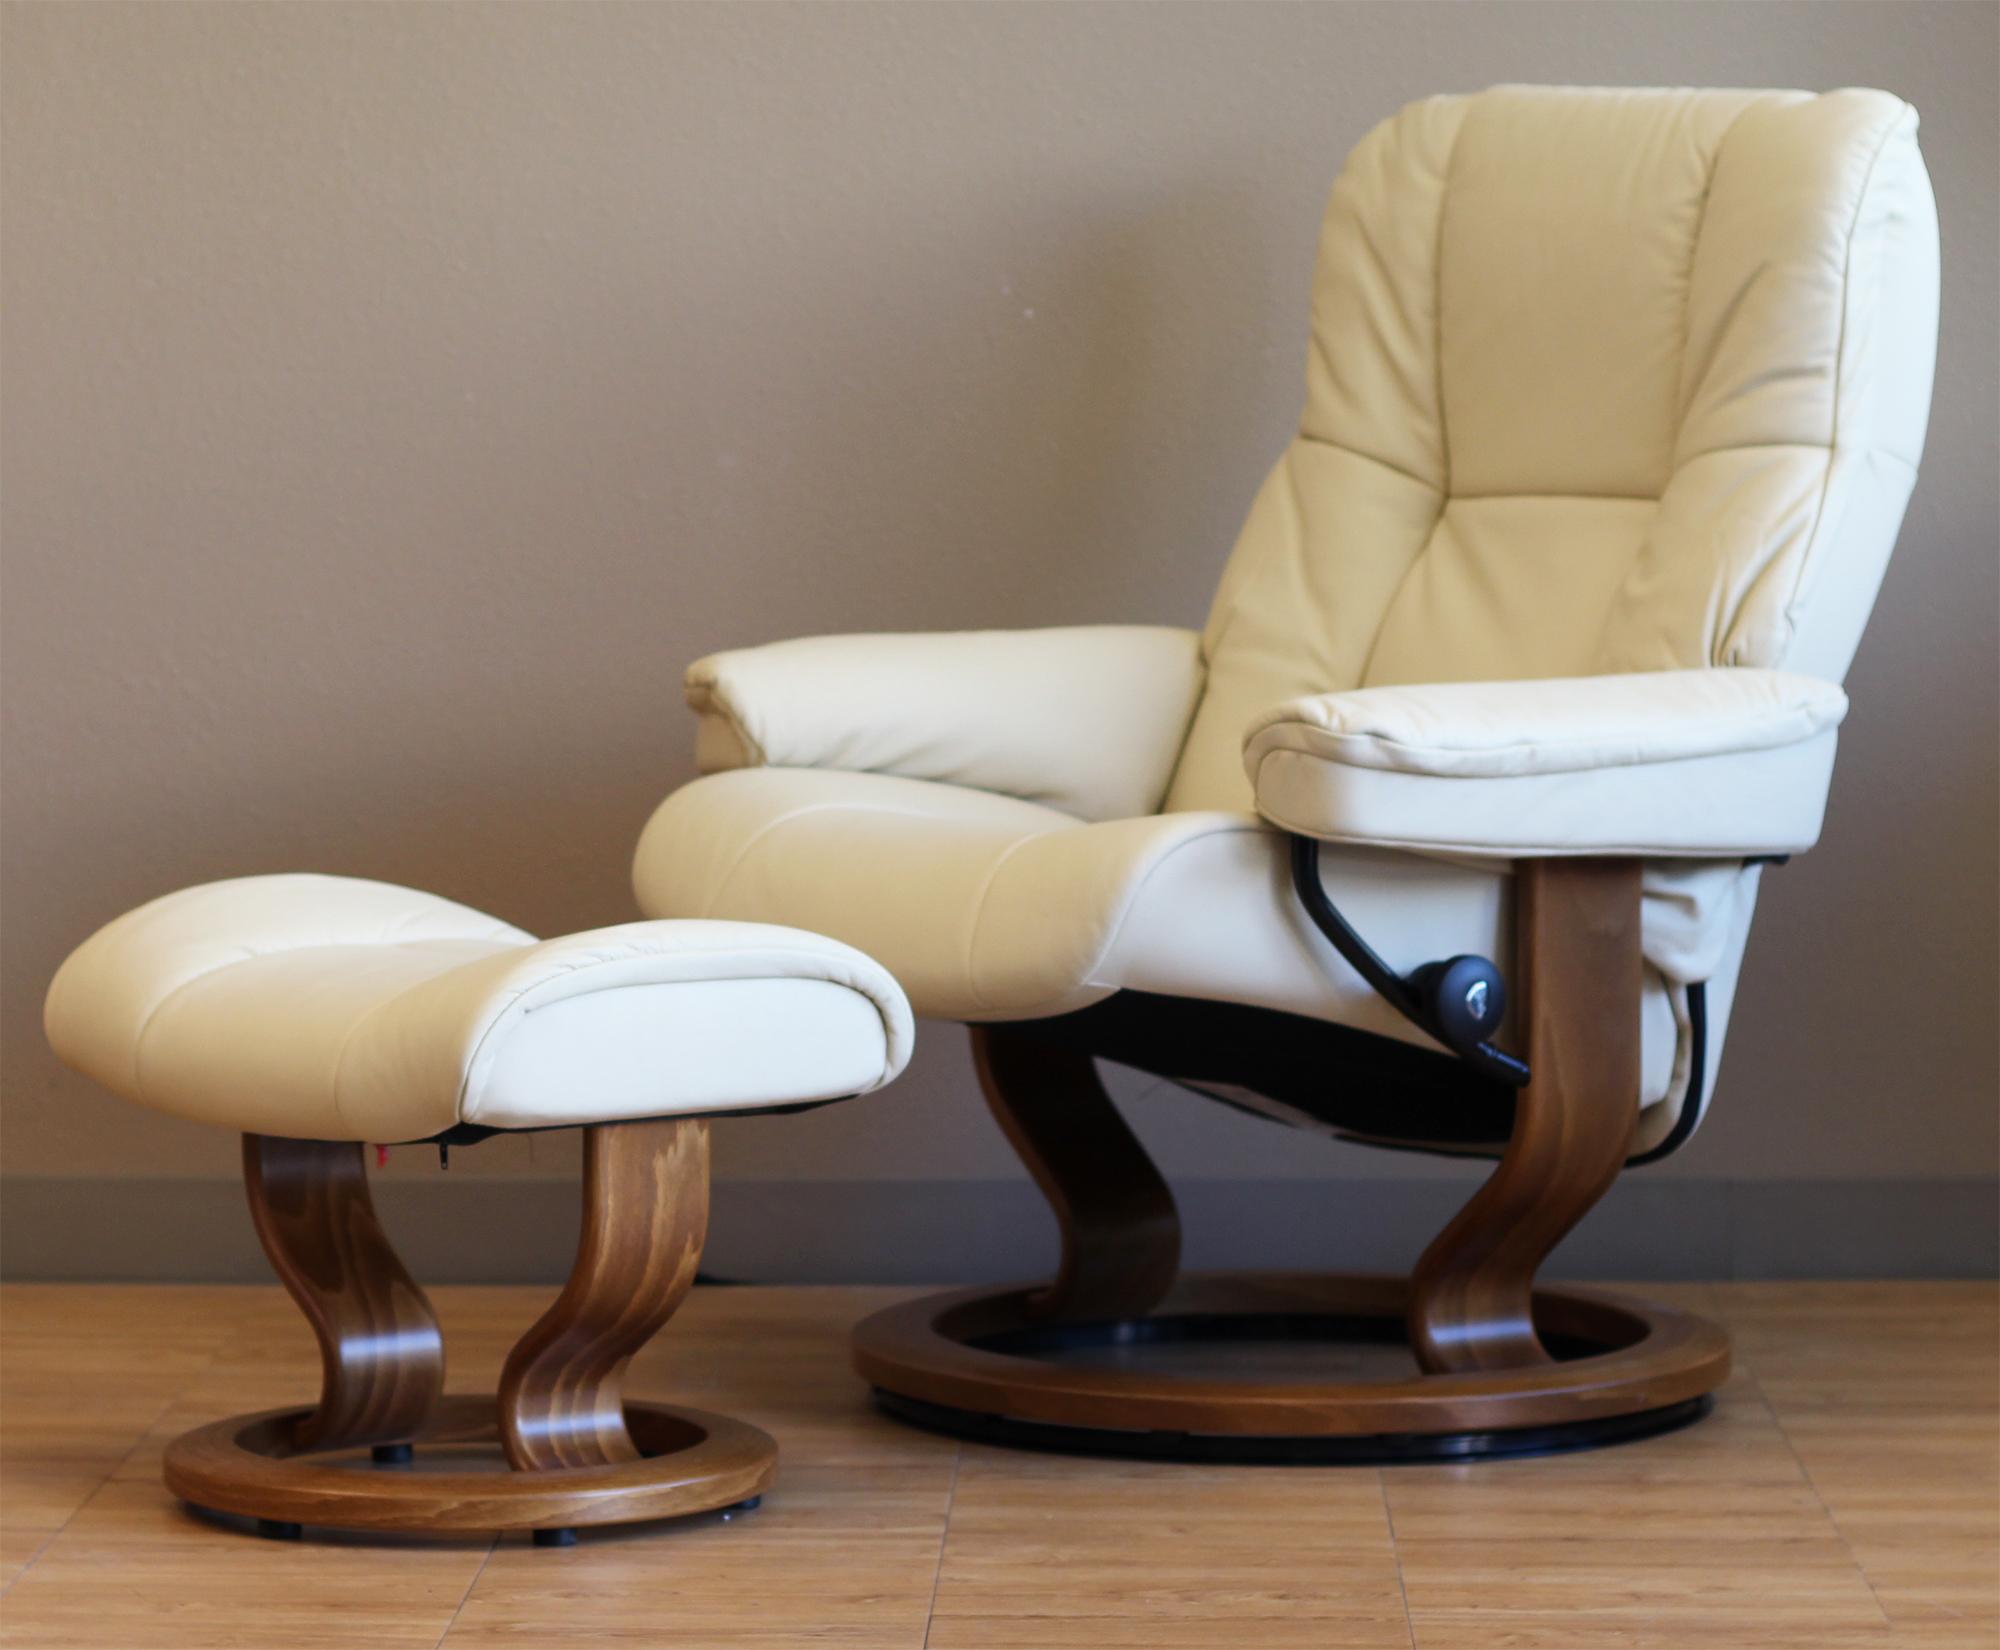 Genial Stressless Mayfair Paloma Kitt Leather Recliner Chair By Ekornes